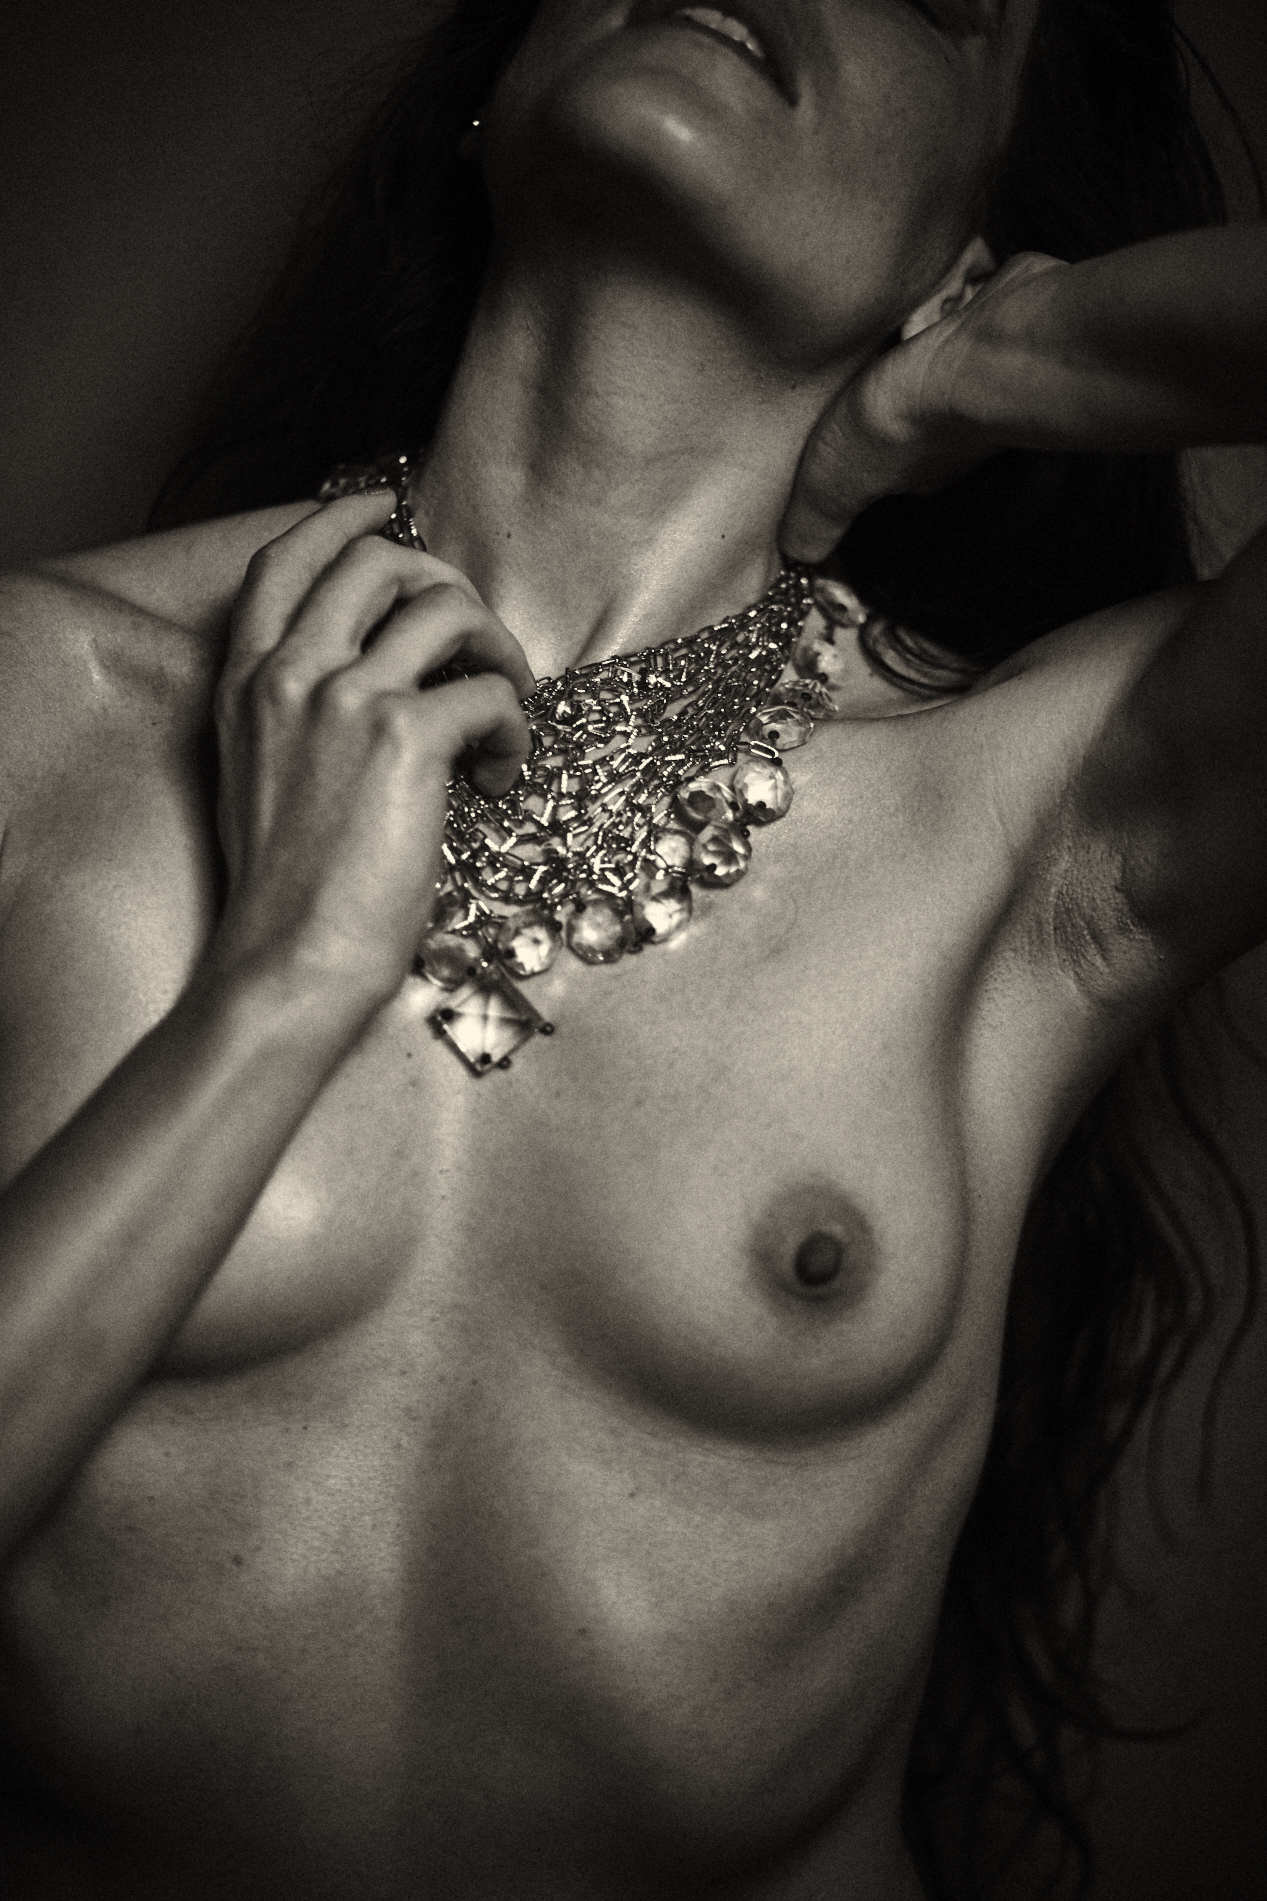 Fays_Chains_21851.jpg